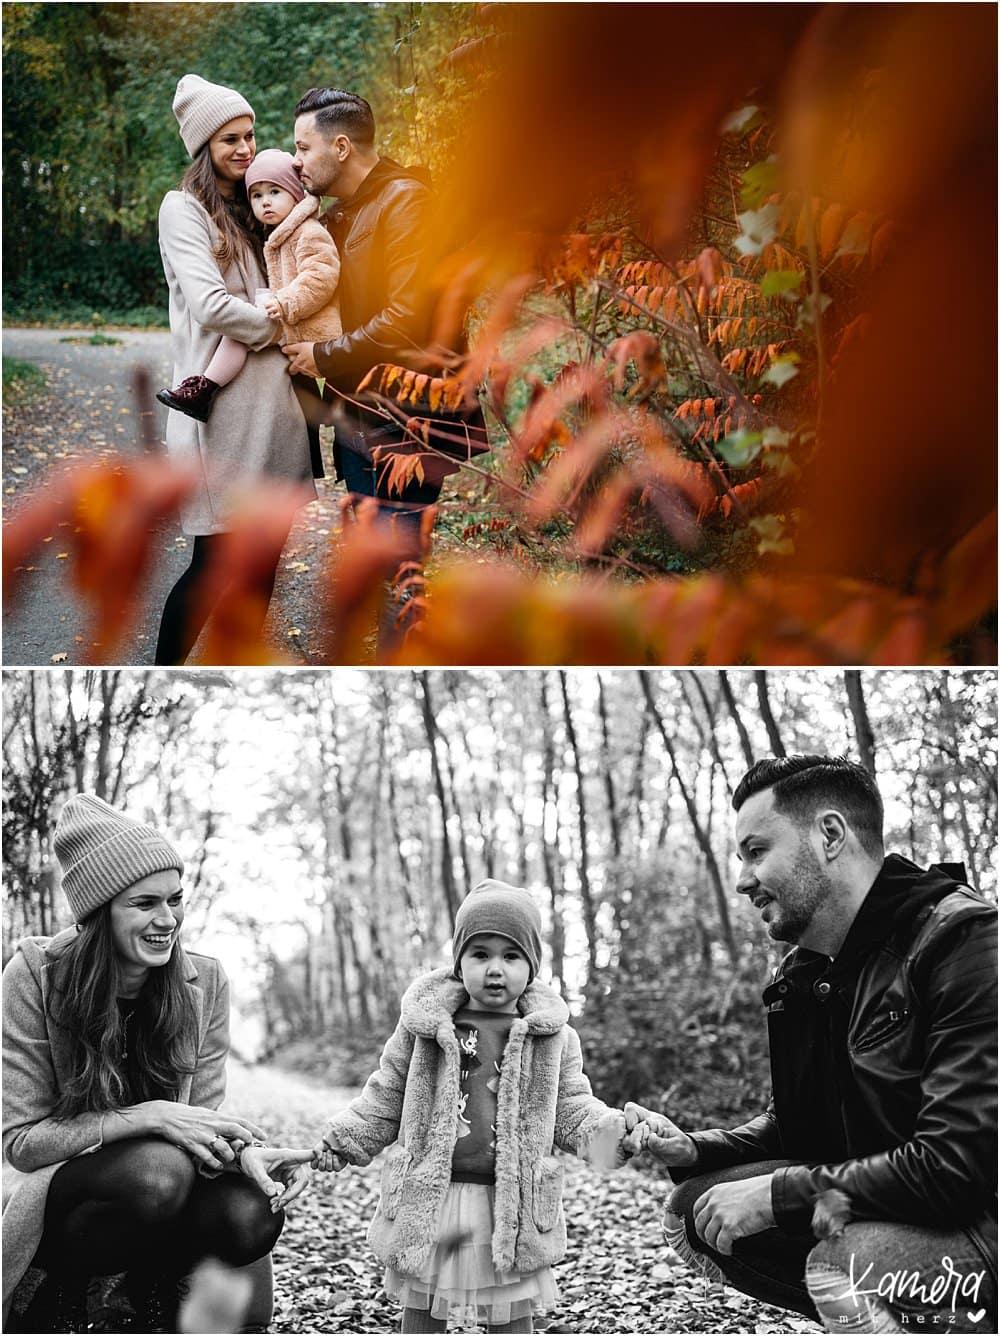 Familienshooting im Herbst in Köln